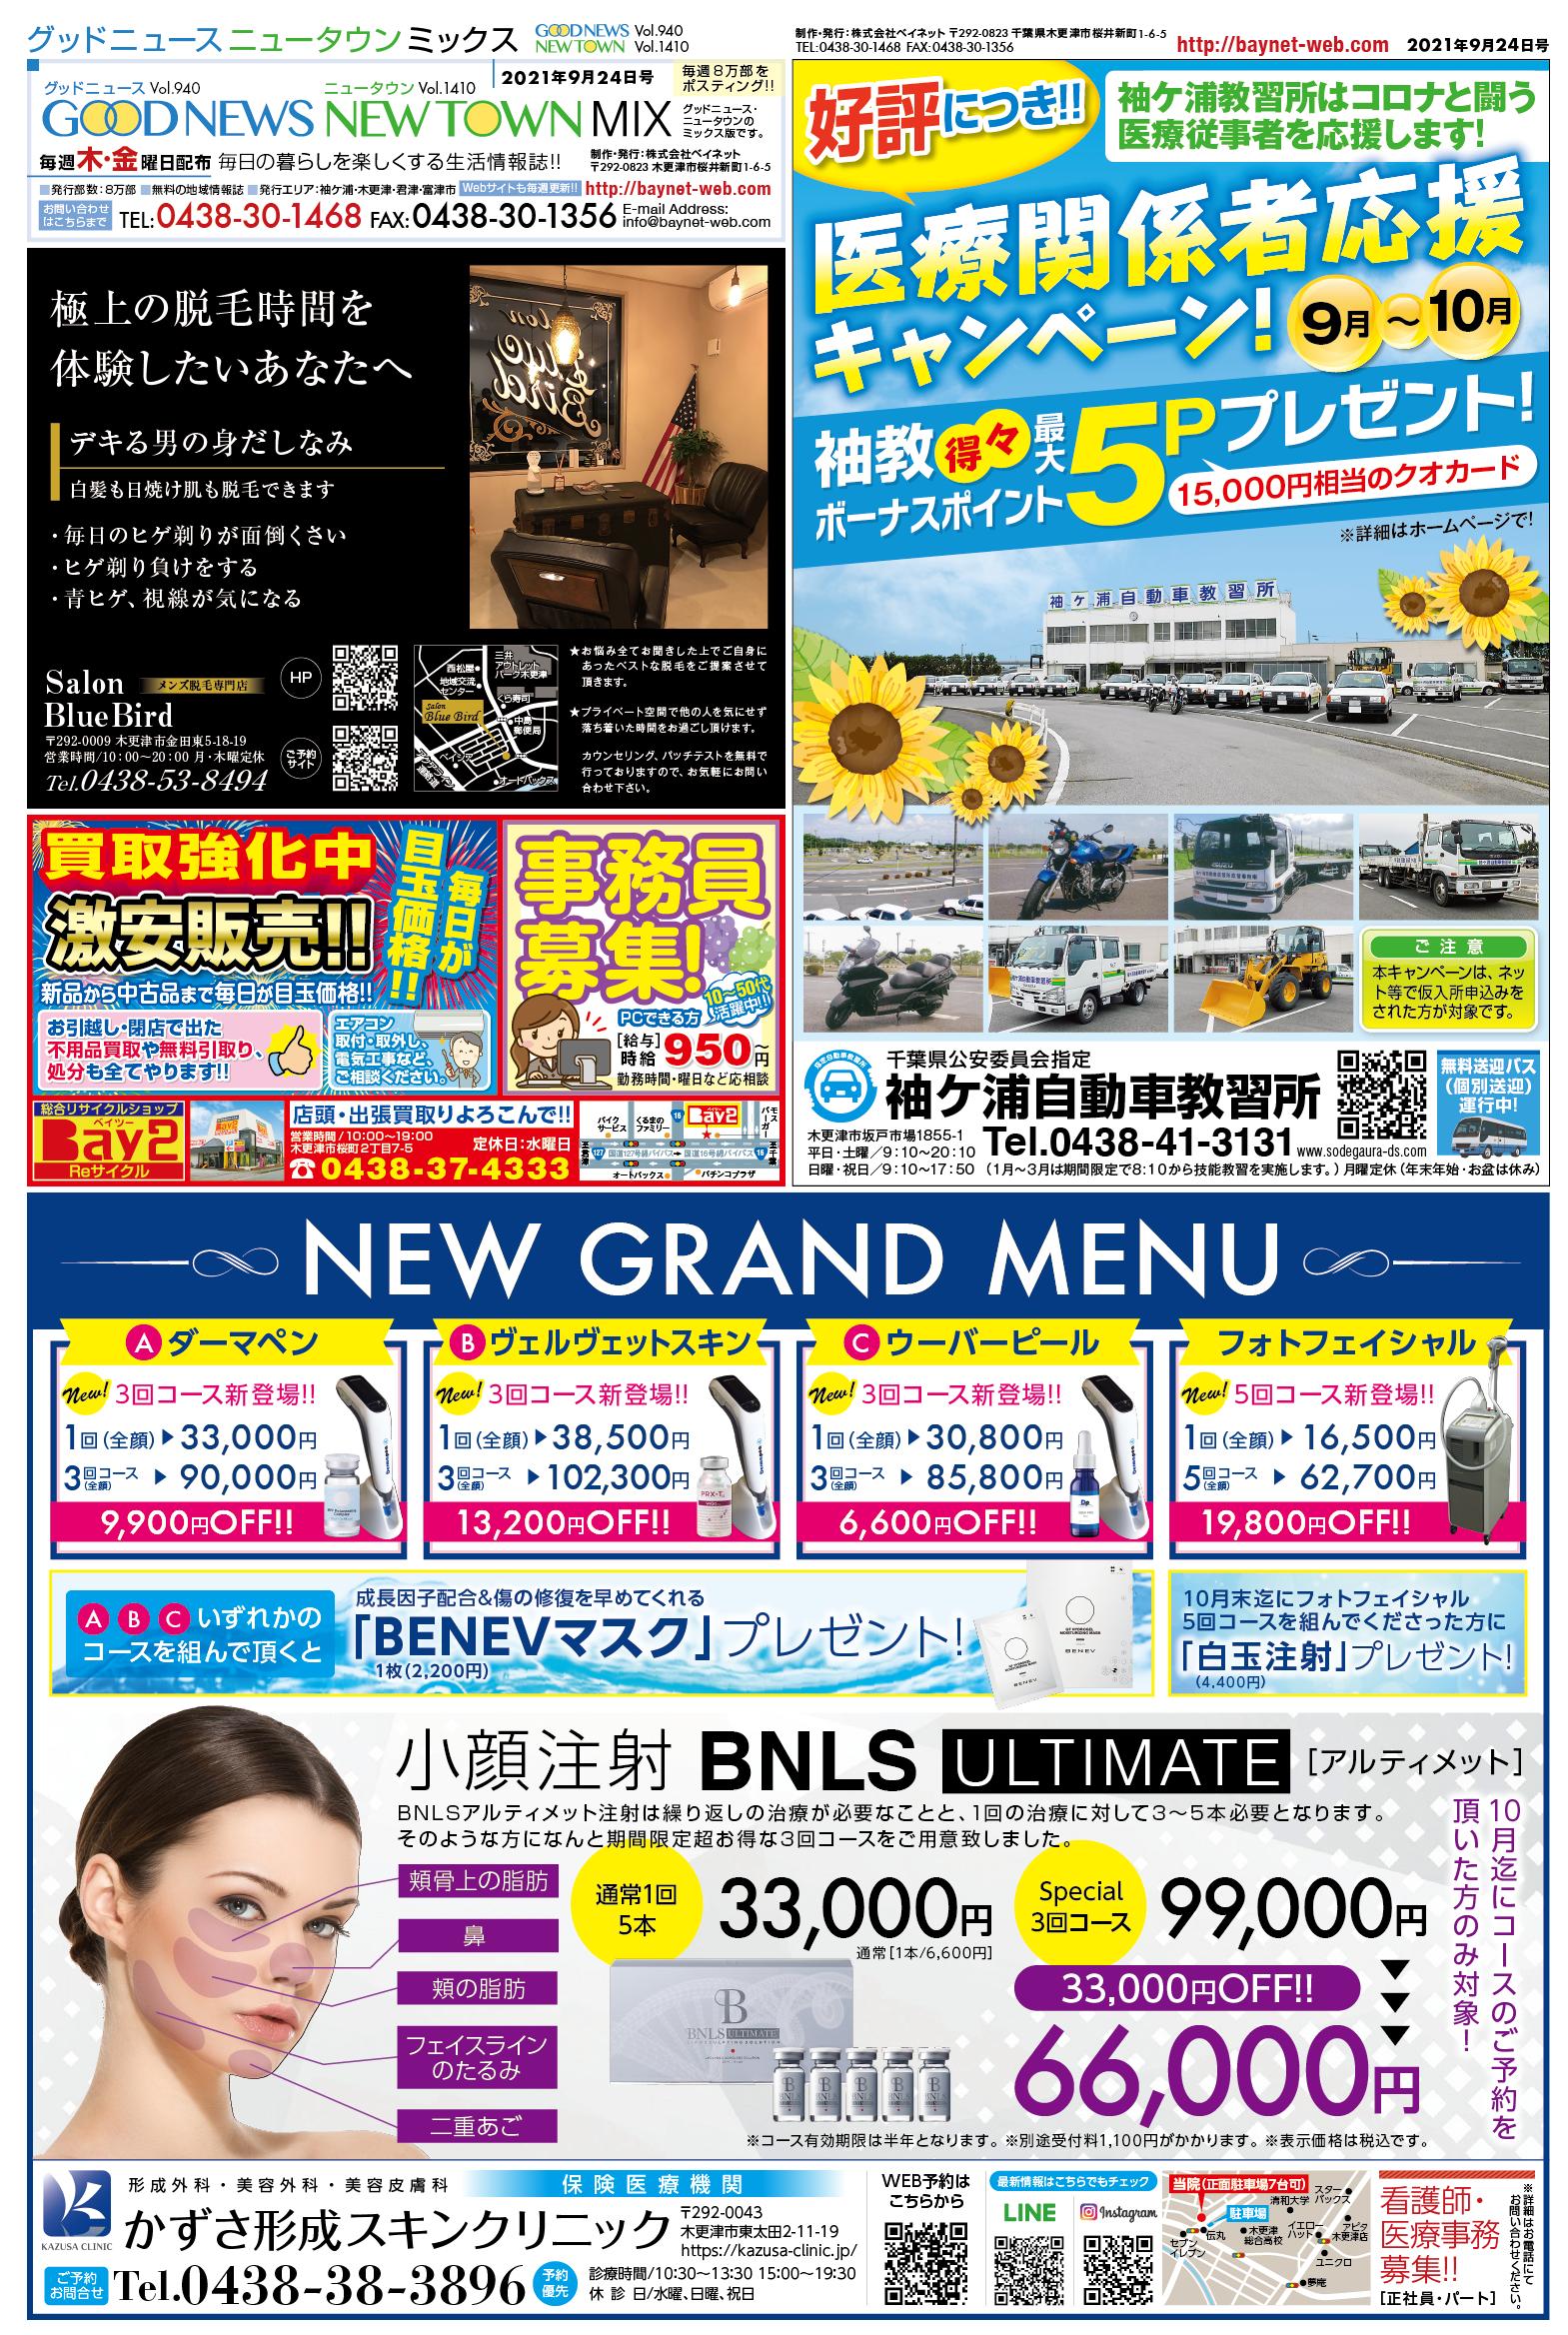 Salon BlueBird Bay2 袖ケ浦自動車教習所 かずさ形成スキンクリニック